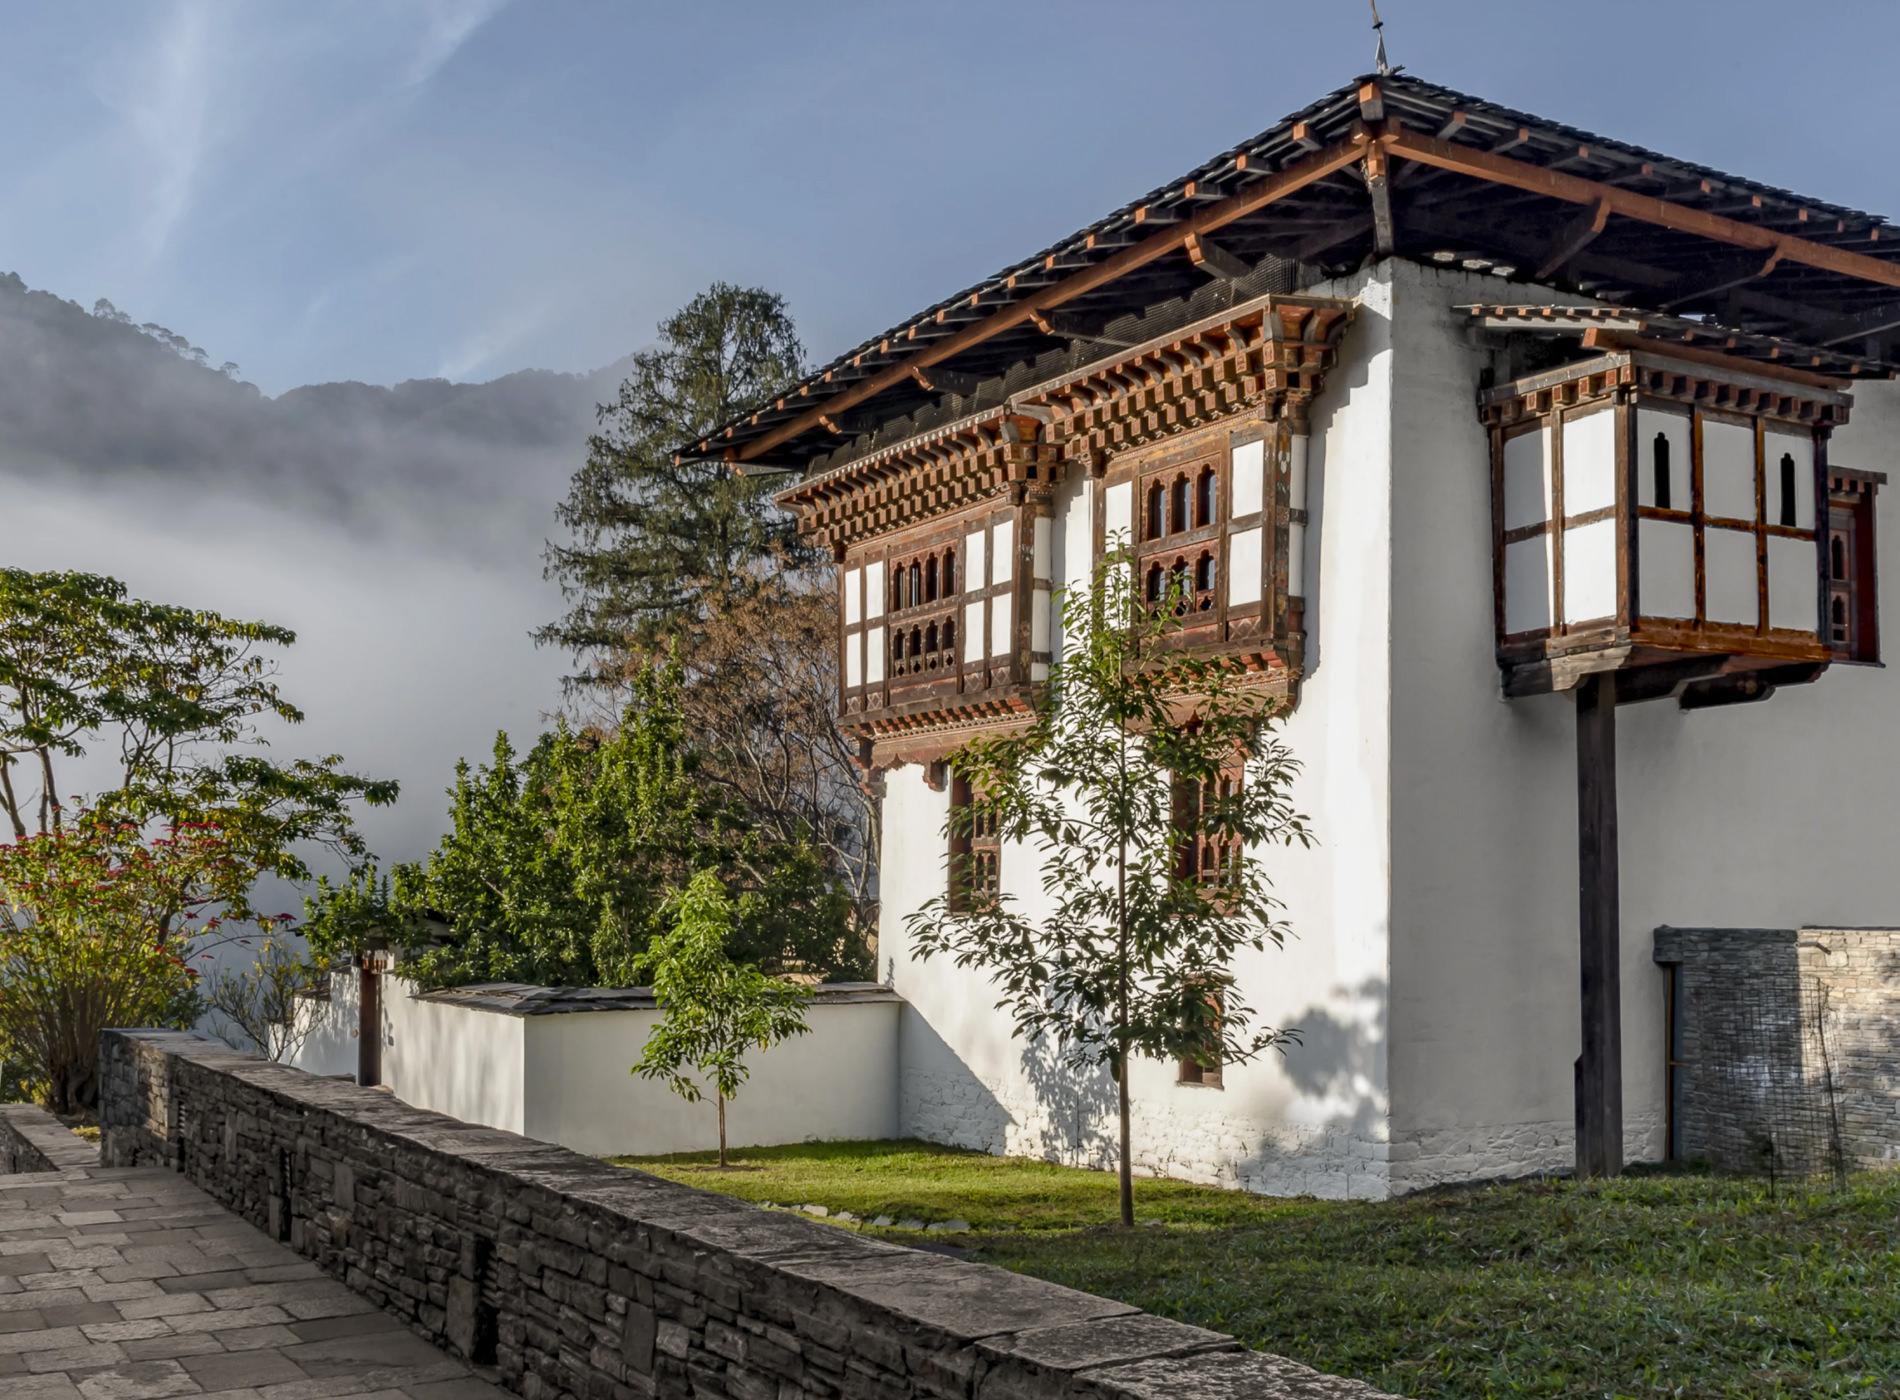 Amankora Lodges Bhoutan Punakha Lodge Architecture